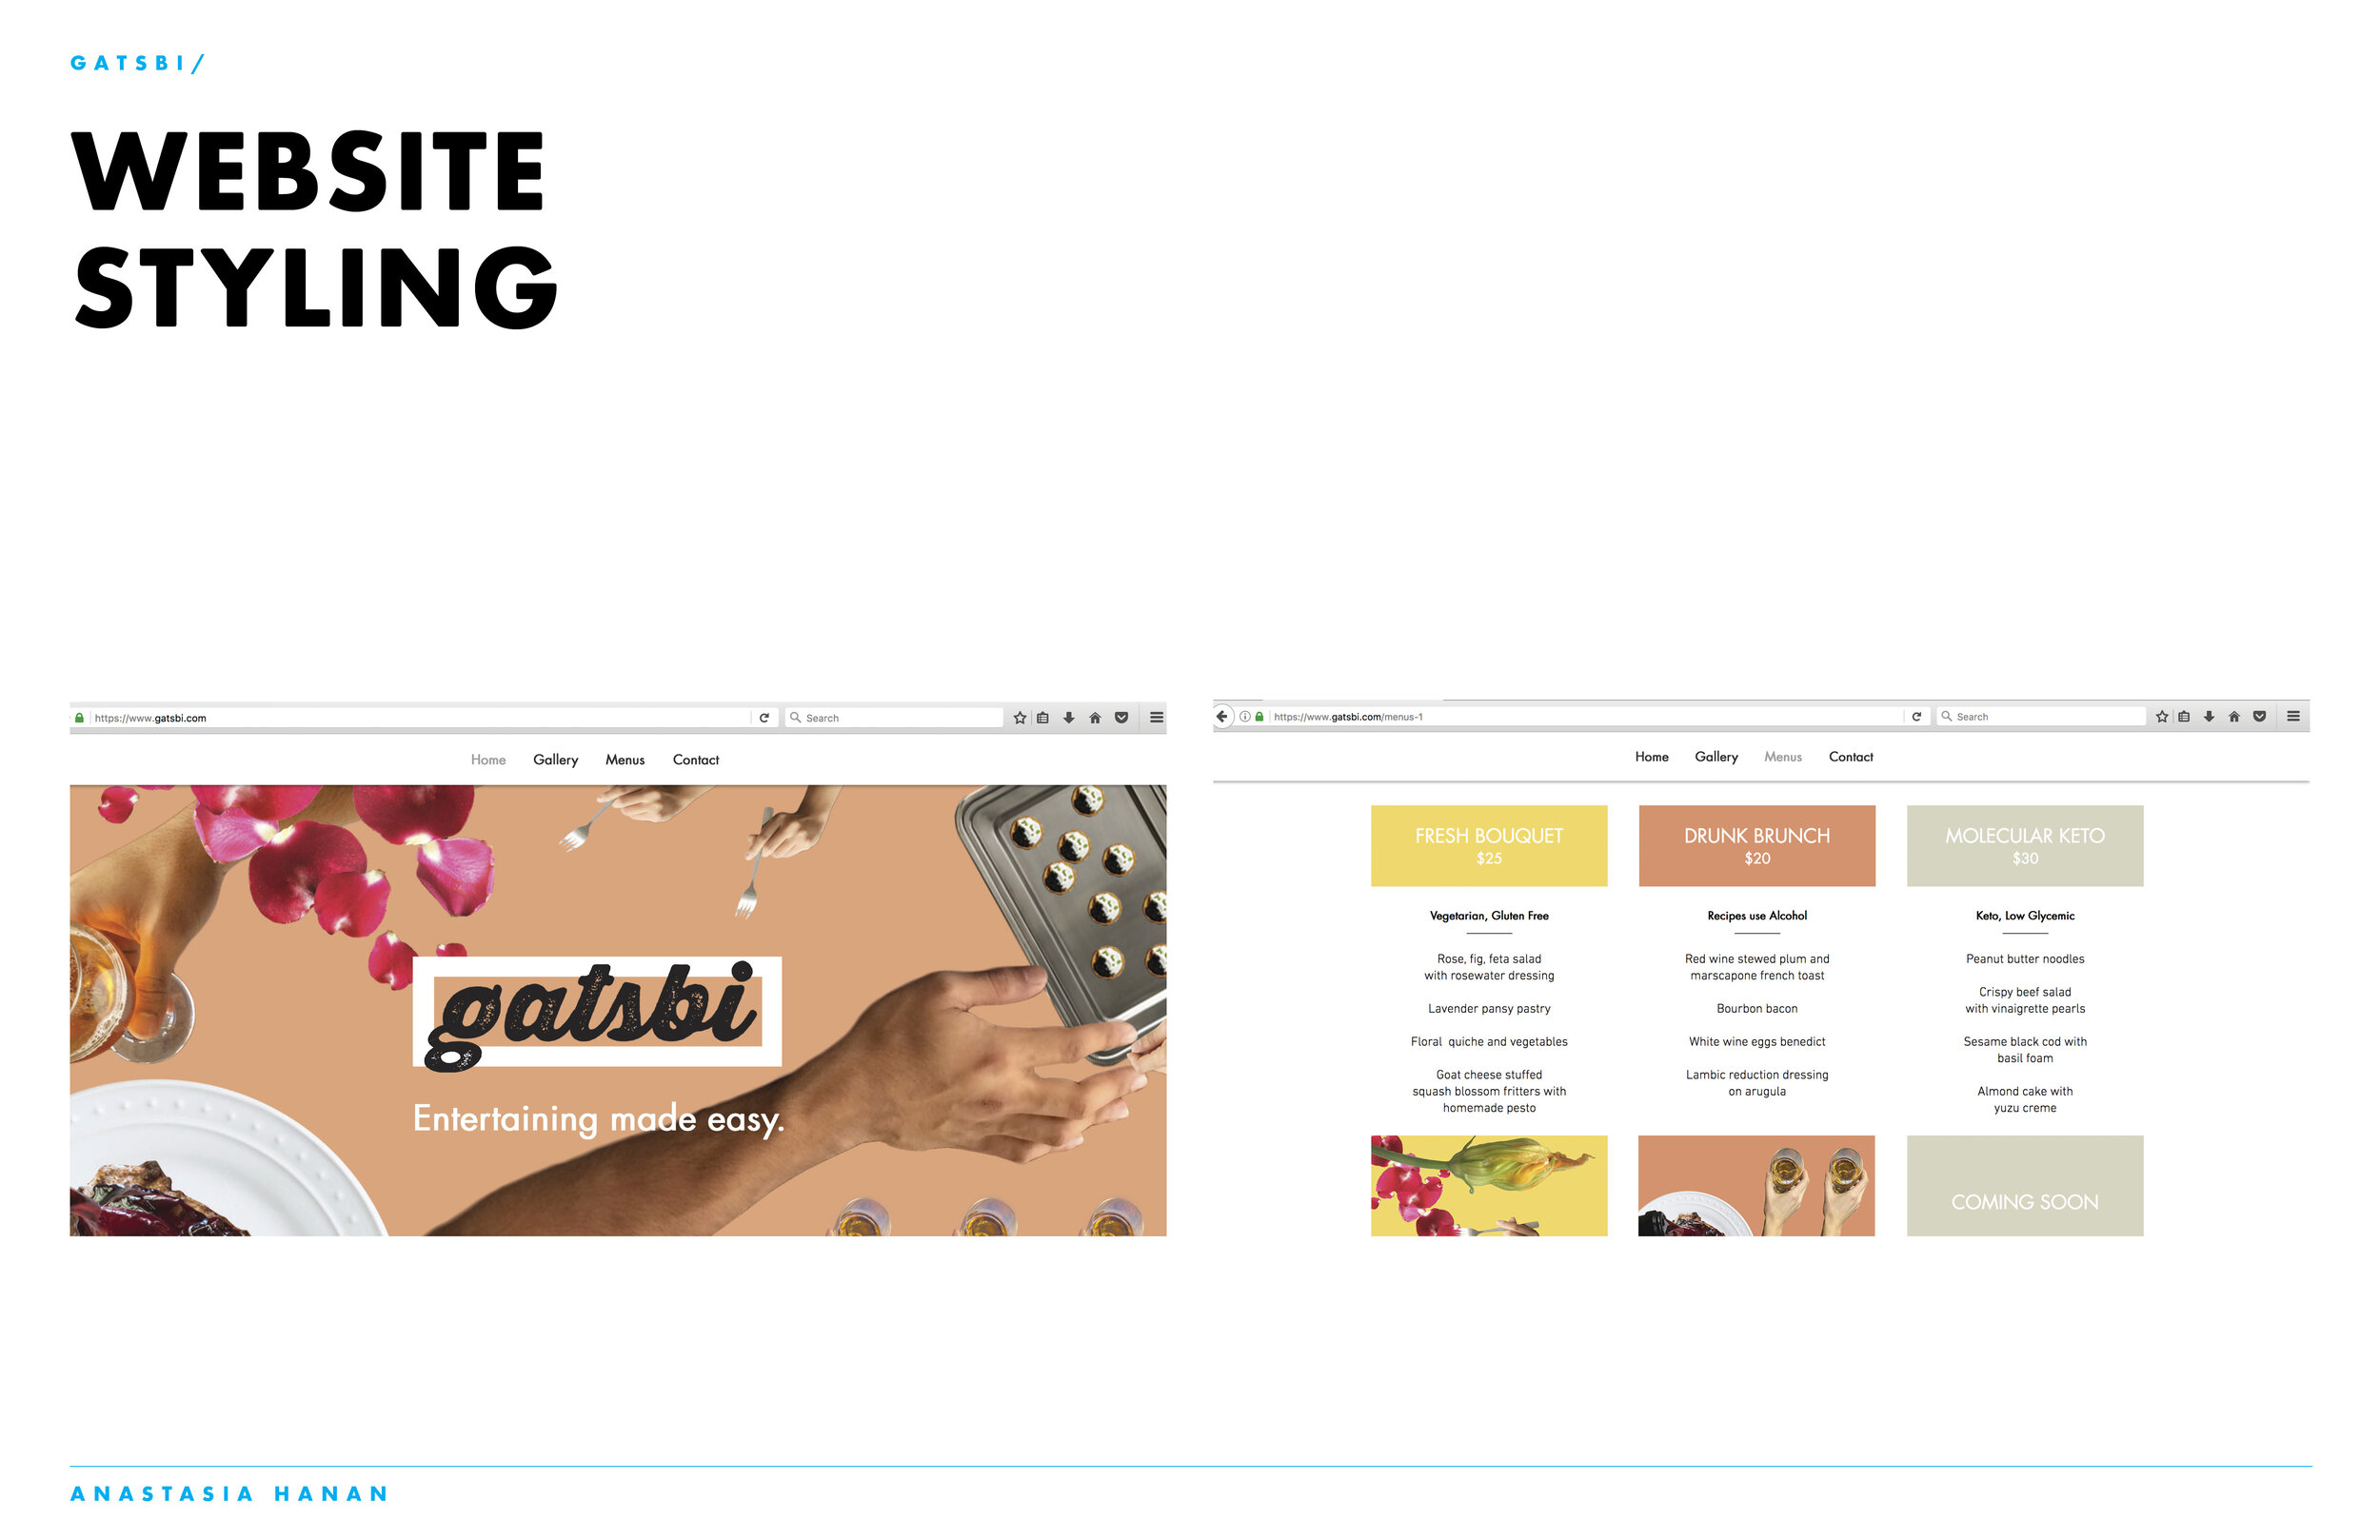 Gatsbi_Process_8.2232.jpg